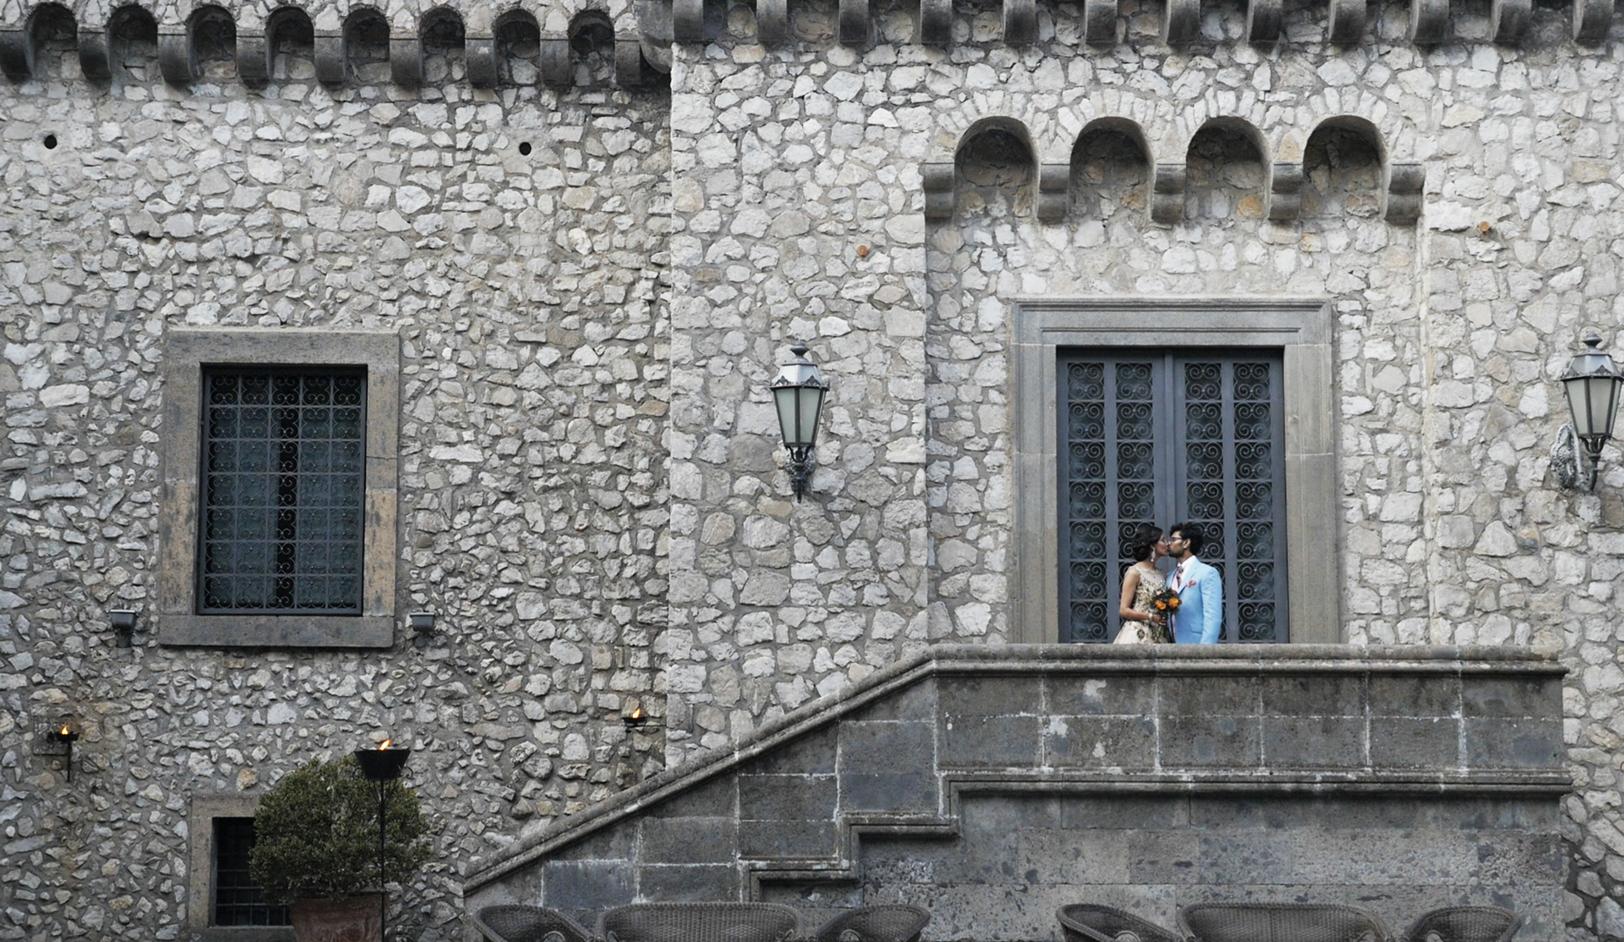 matrimonio-indiano-castello-medievale-castellamare-di-stabia-amalfi.jpg